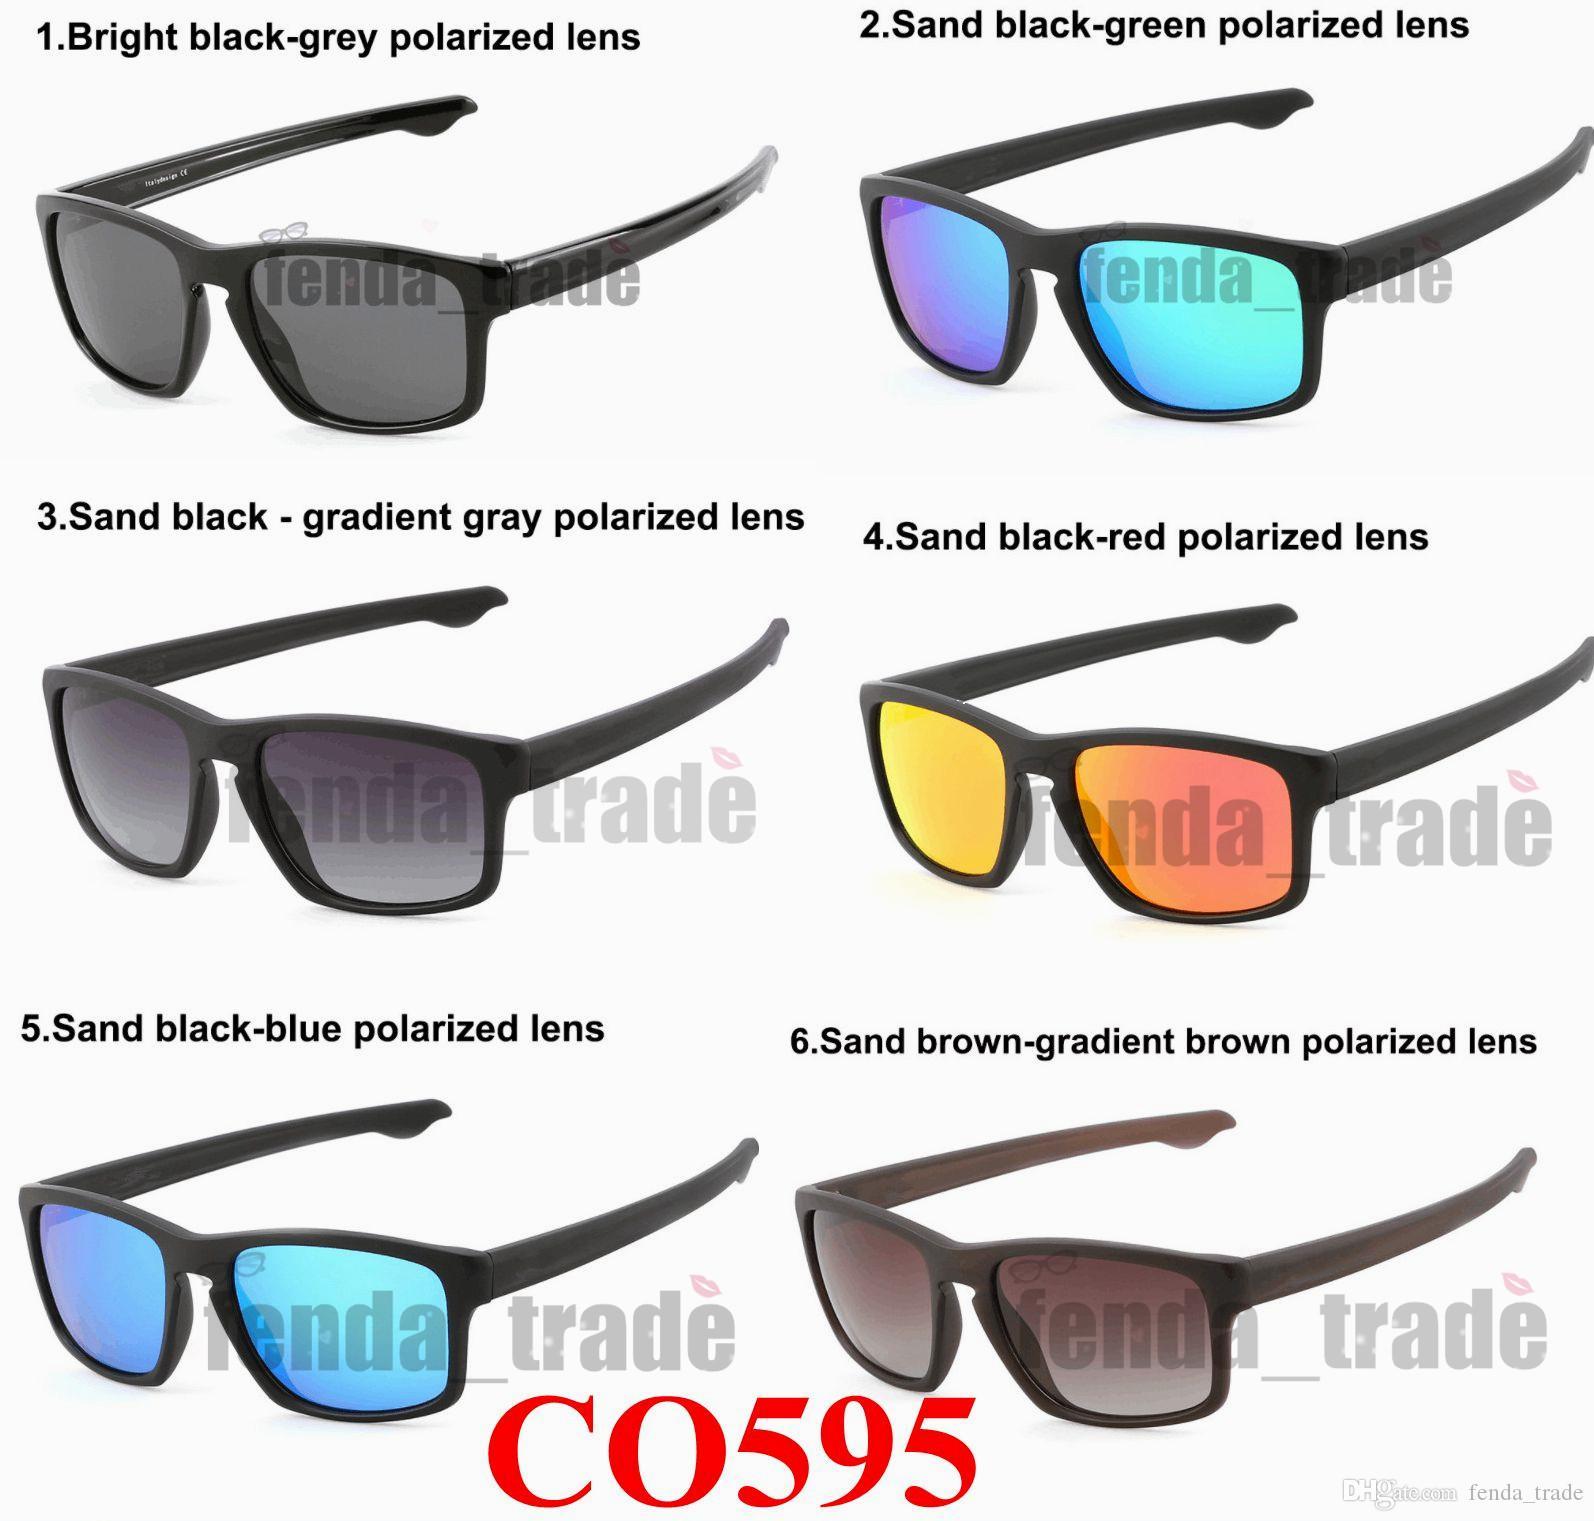 57f2d49c808 Factory HOT TR90 Polarized Man Sunglasse TAC LENS Driving Sun Glasses Woman  Surfing Sunglasses Women HOT Sunglasses 2019 NEW Circle Sunglasses Glass  Frames ...